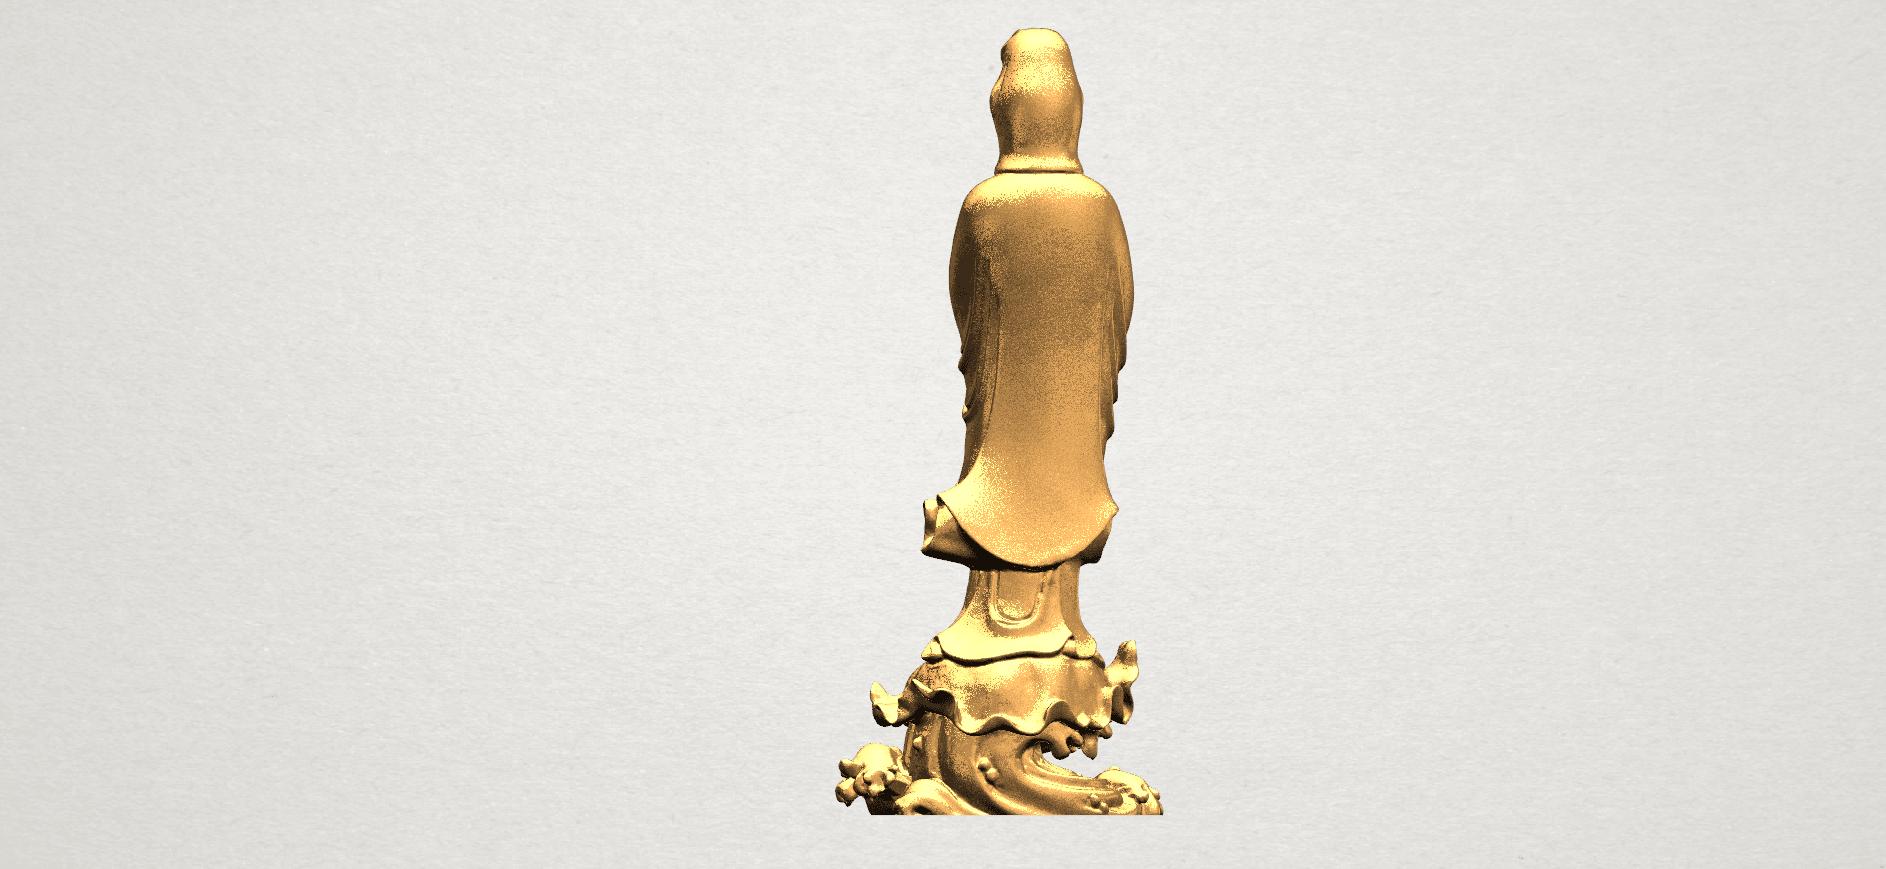 Avalokitesvara Buddha - Standing (v) A06.png Download free STL file Avalokitesvara Buddha - Standing 05 • 3D printer template, GeorgesNikkei